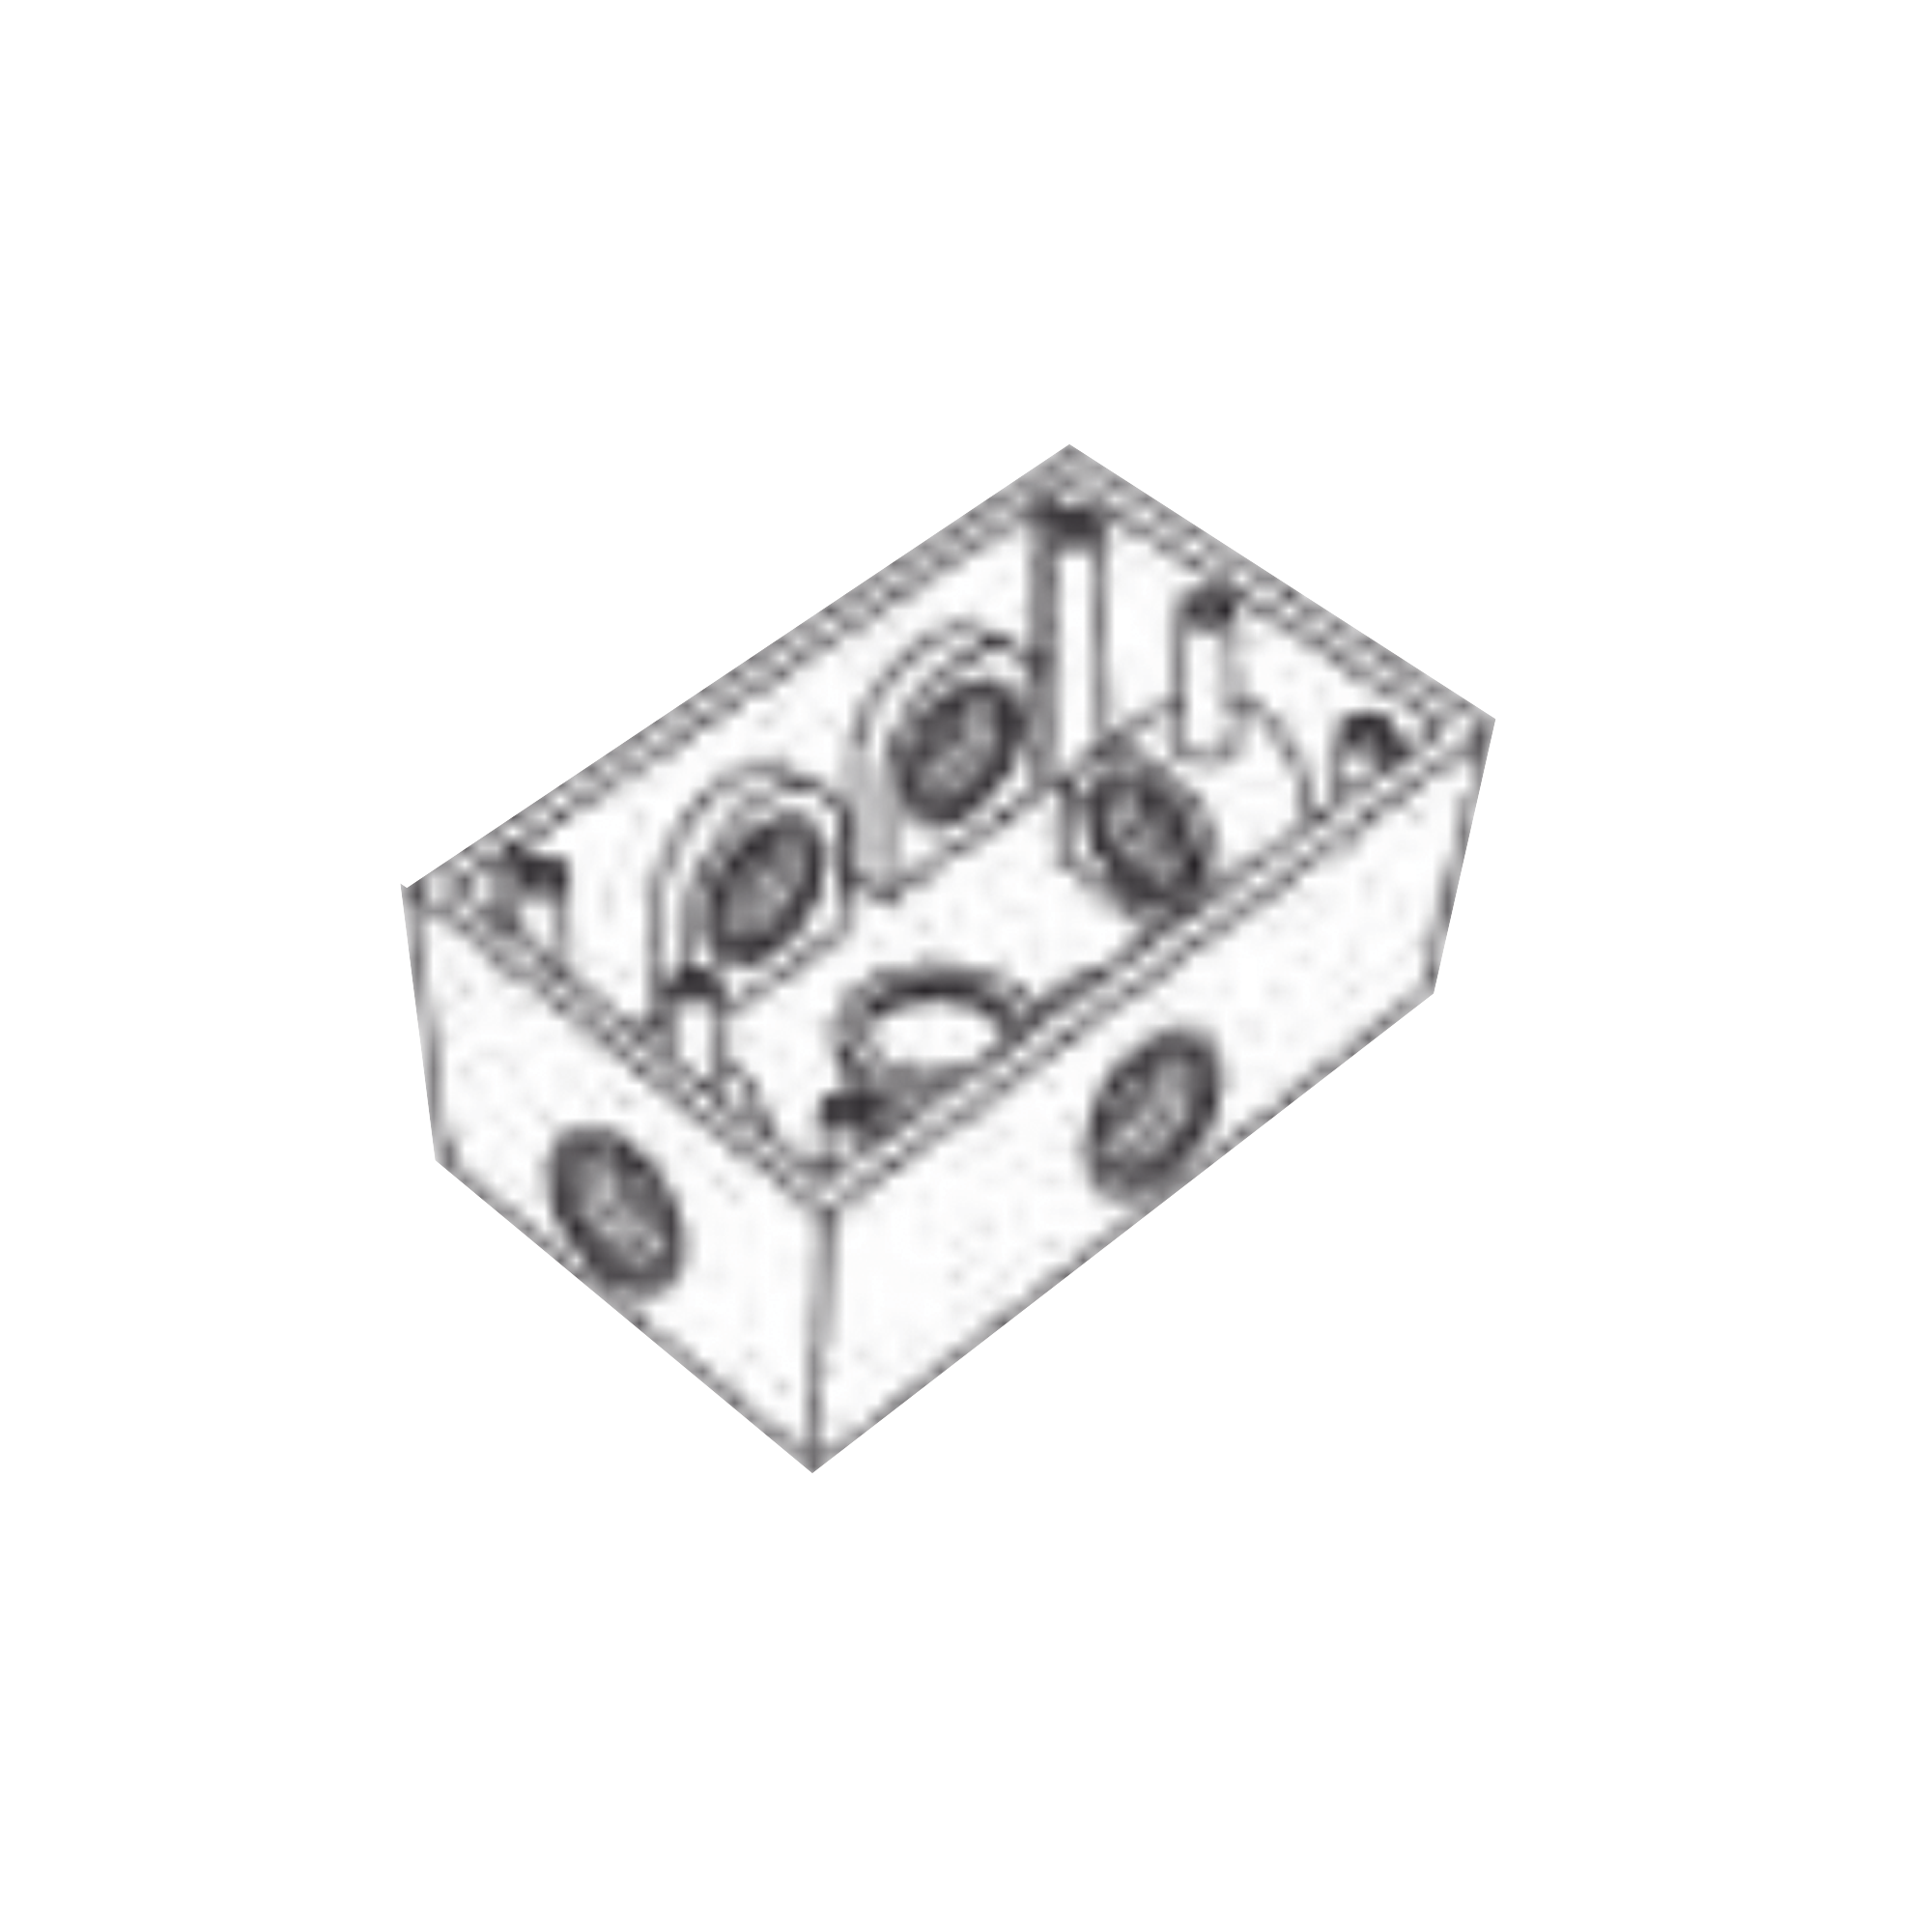 Caja Condulet FS de 1/2 ( 12.7 mm) con seis bocas a prueba de intemperie.